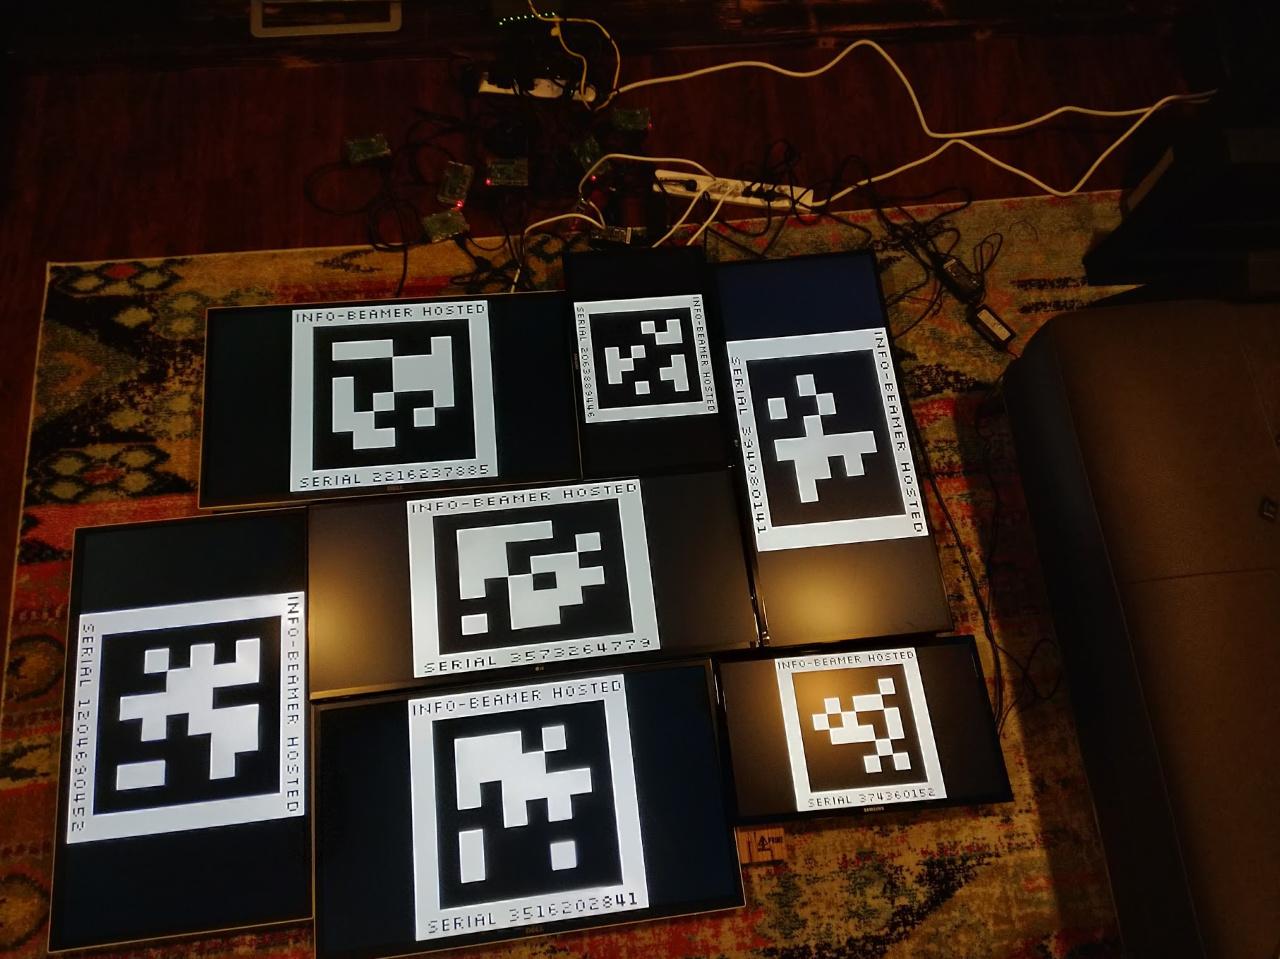 Home DIY - 7 screen videowall feature - Your info-beamer ...